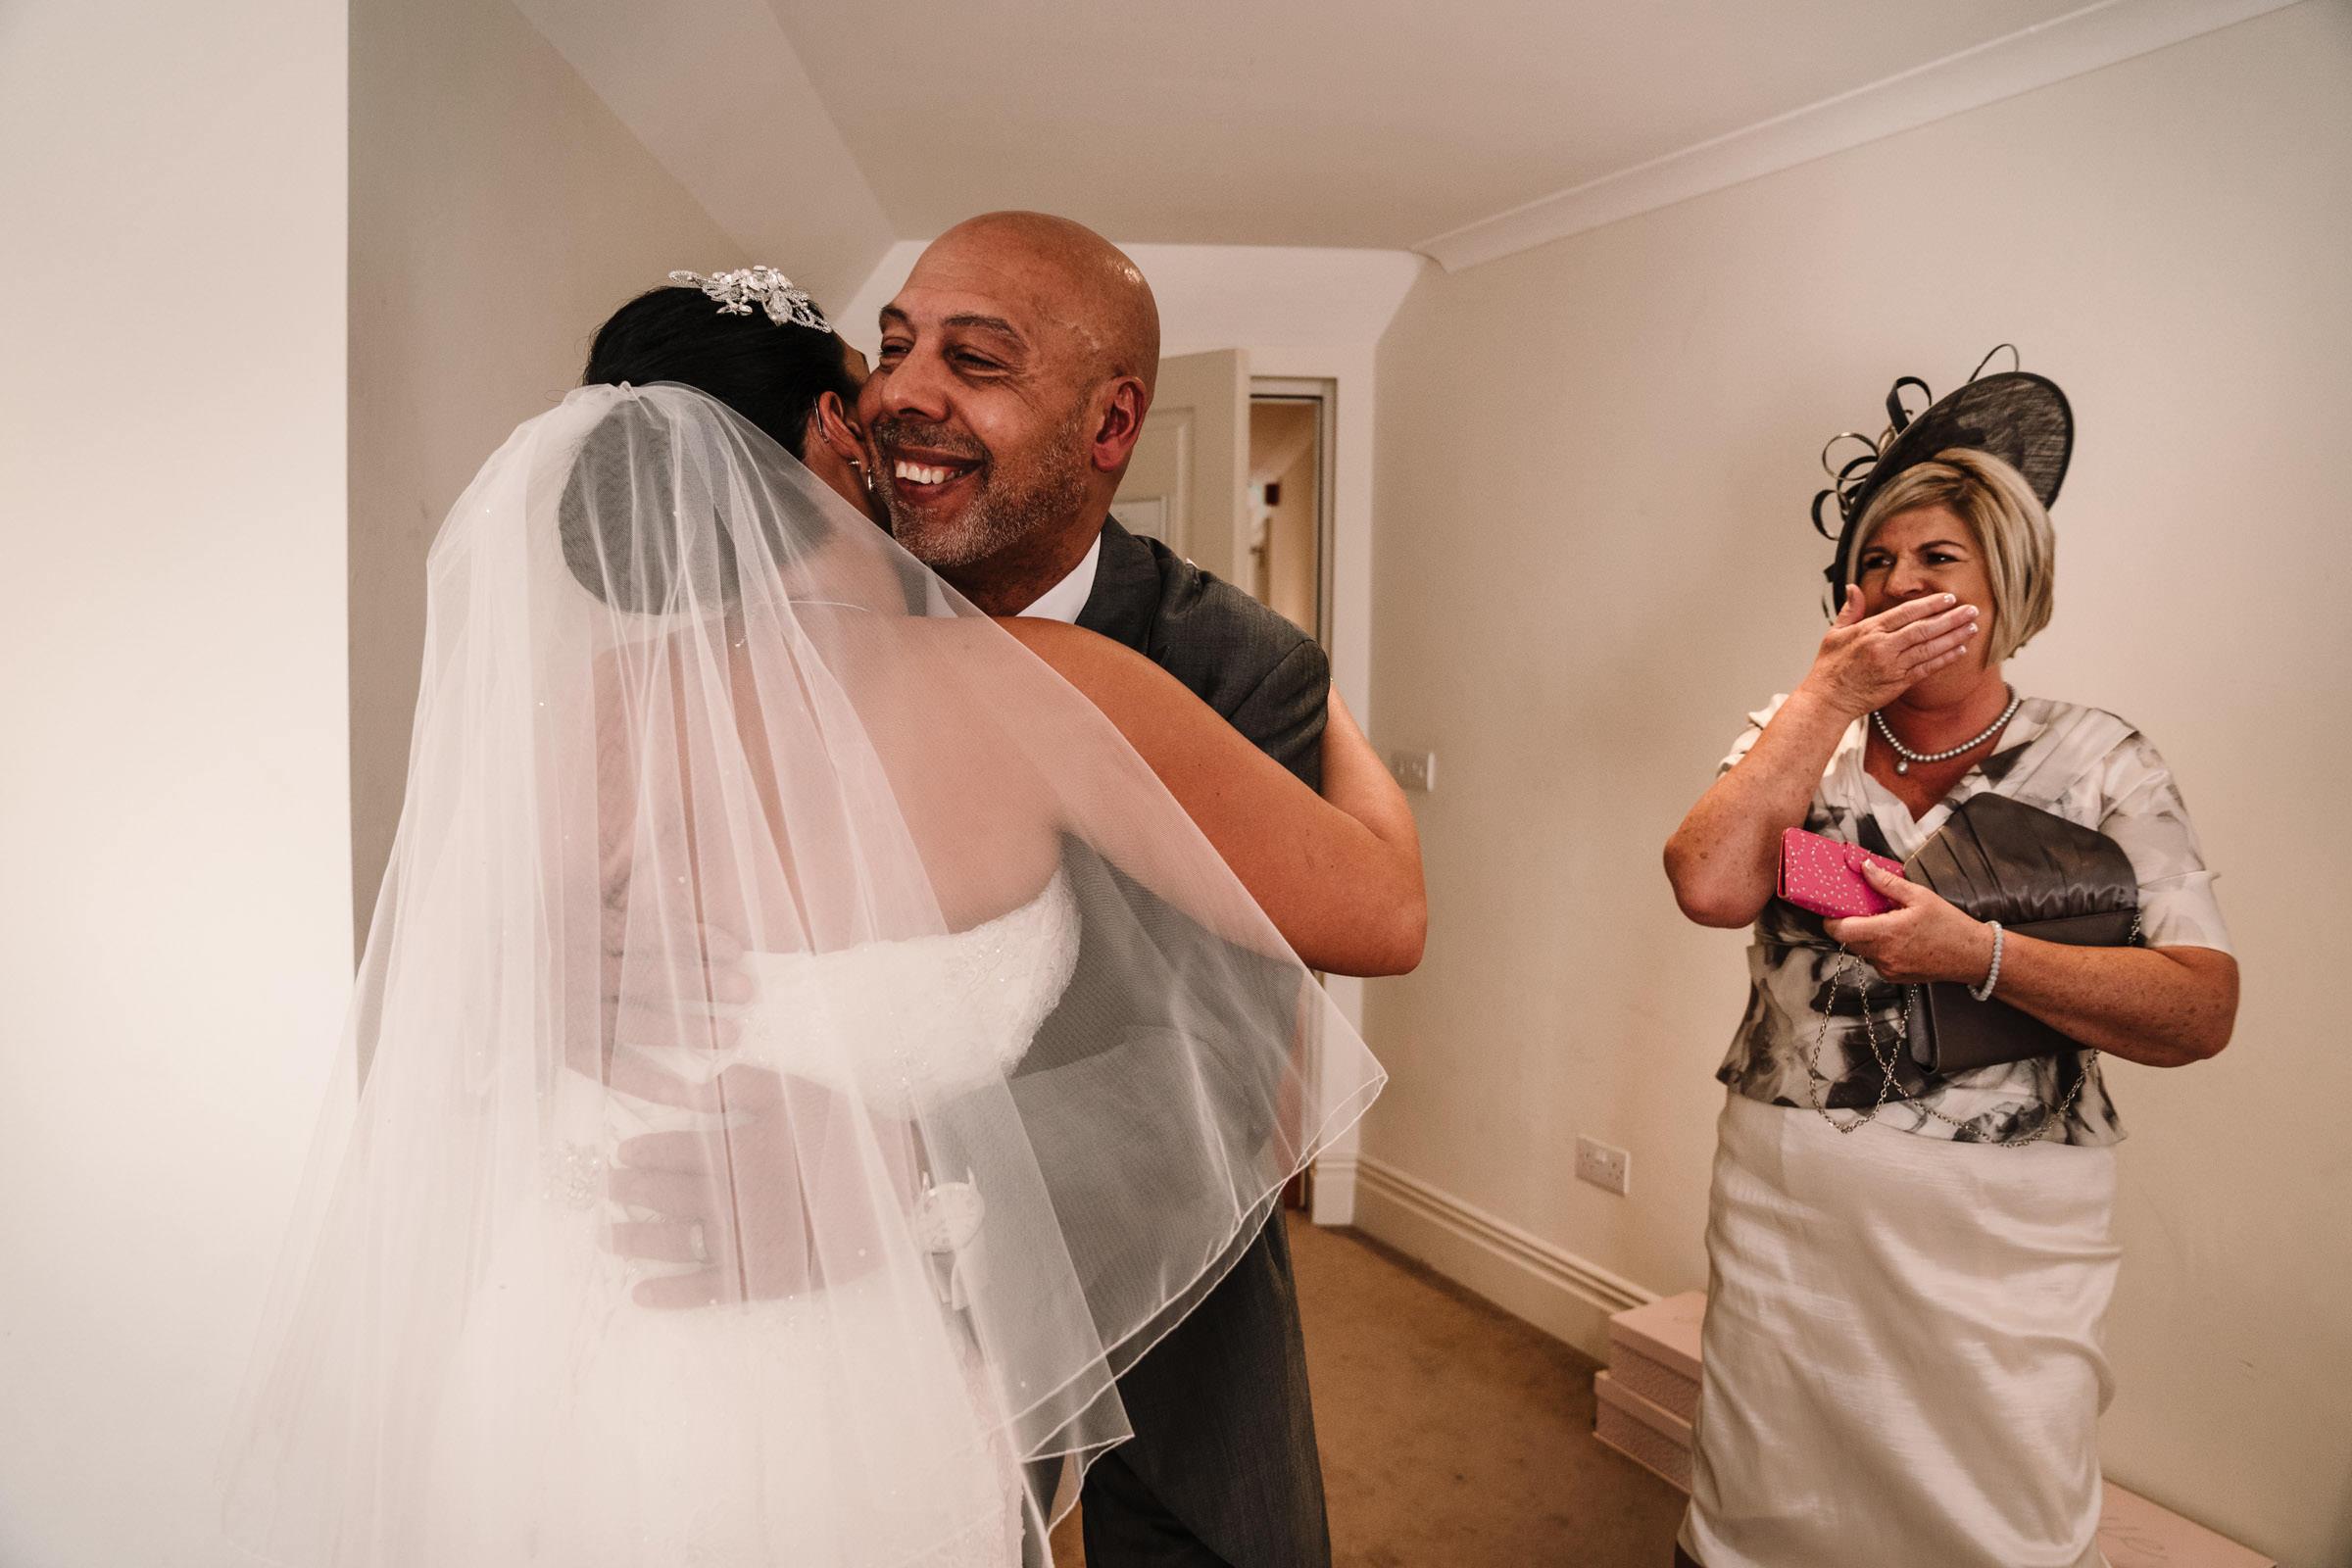 Dad hugging bride, mum getting emotional